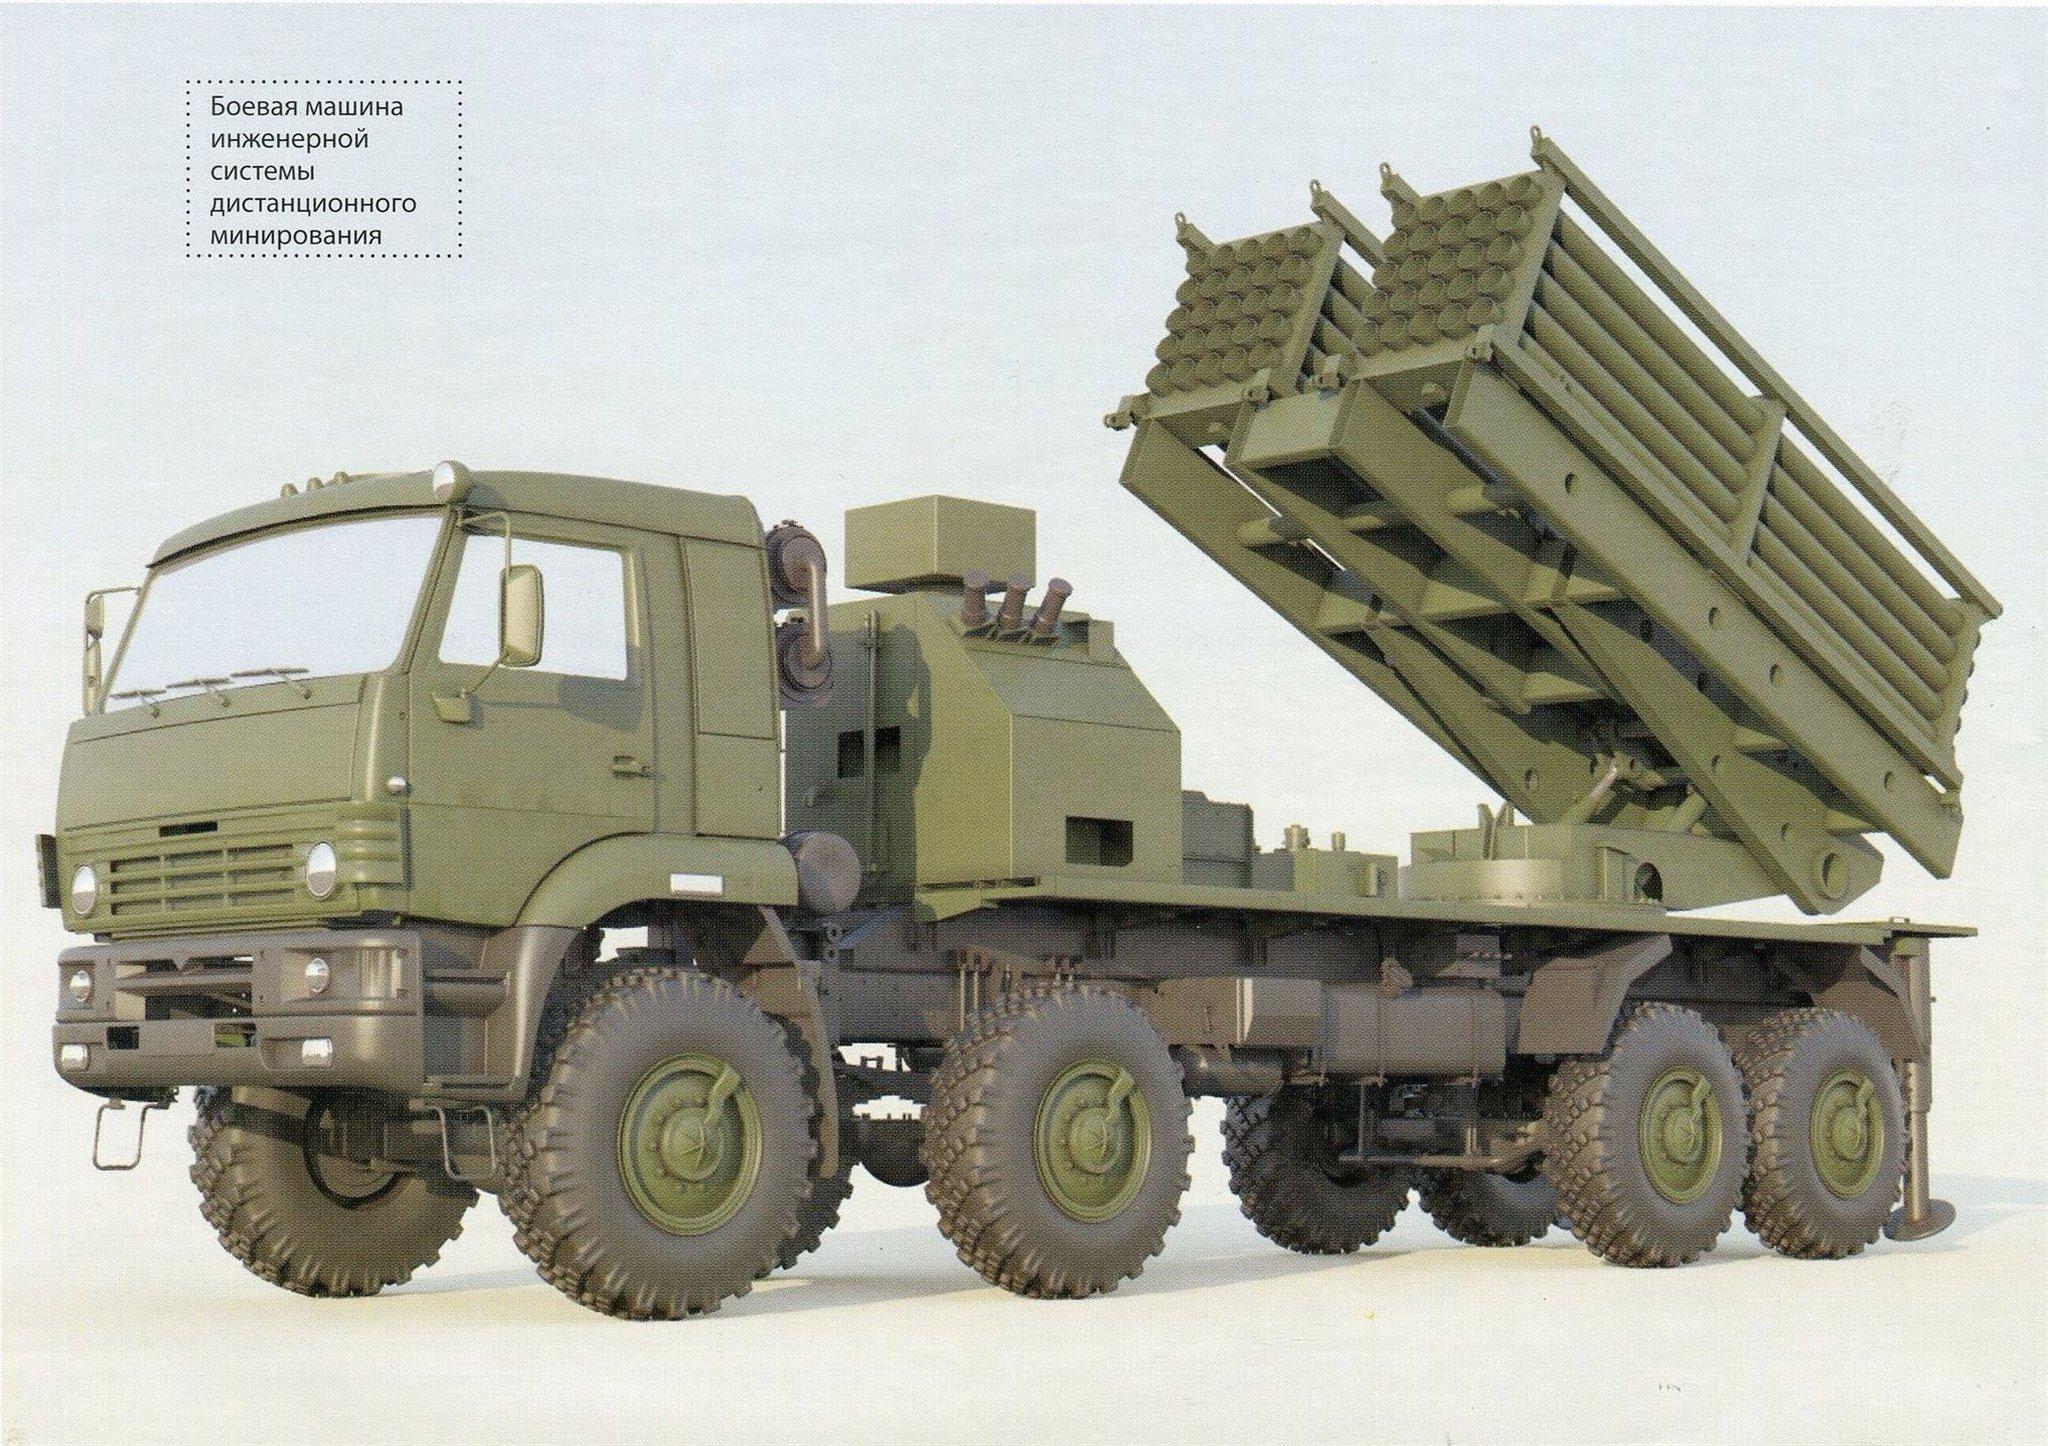 Russian MRLS: Grad, Uragan, Smerch, Tornado-G/S - Page 11 ESiLtzjU8AA4RBY?format=jpg&name=large